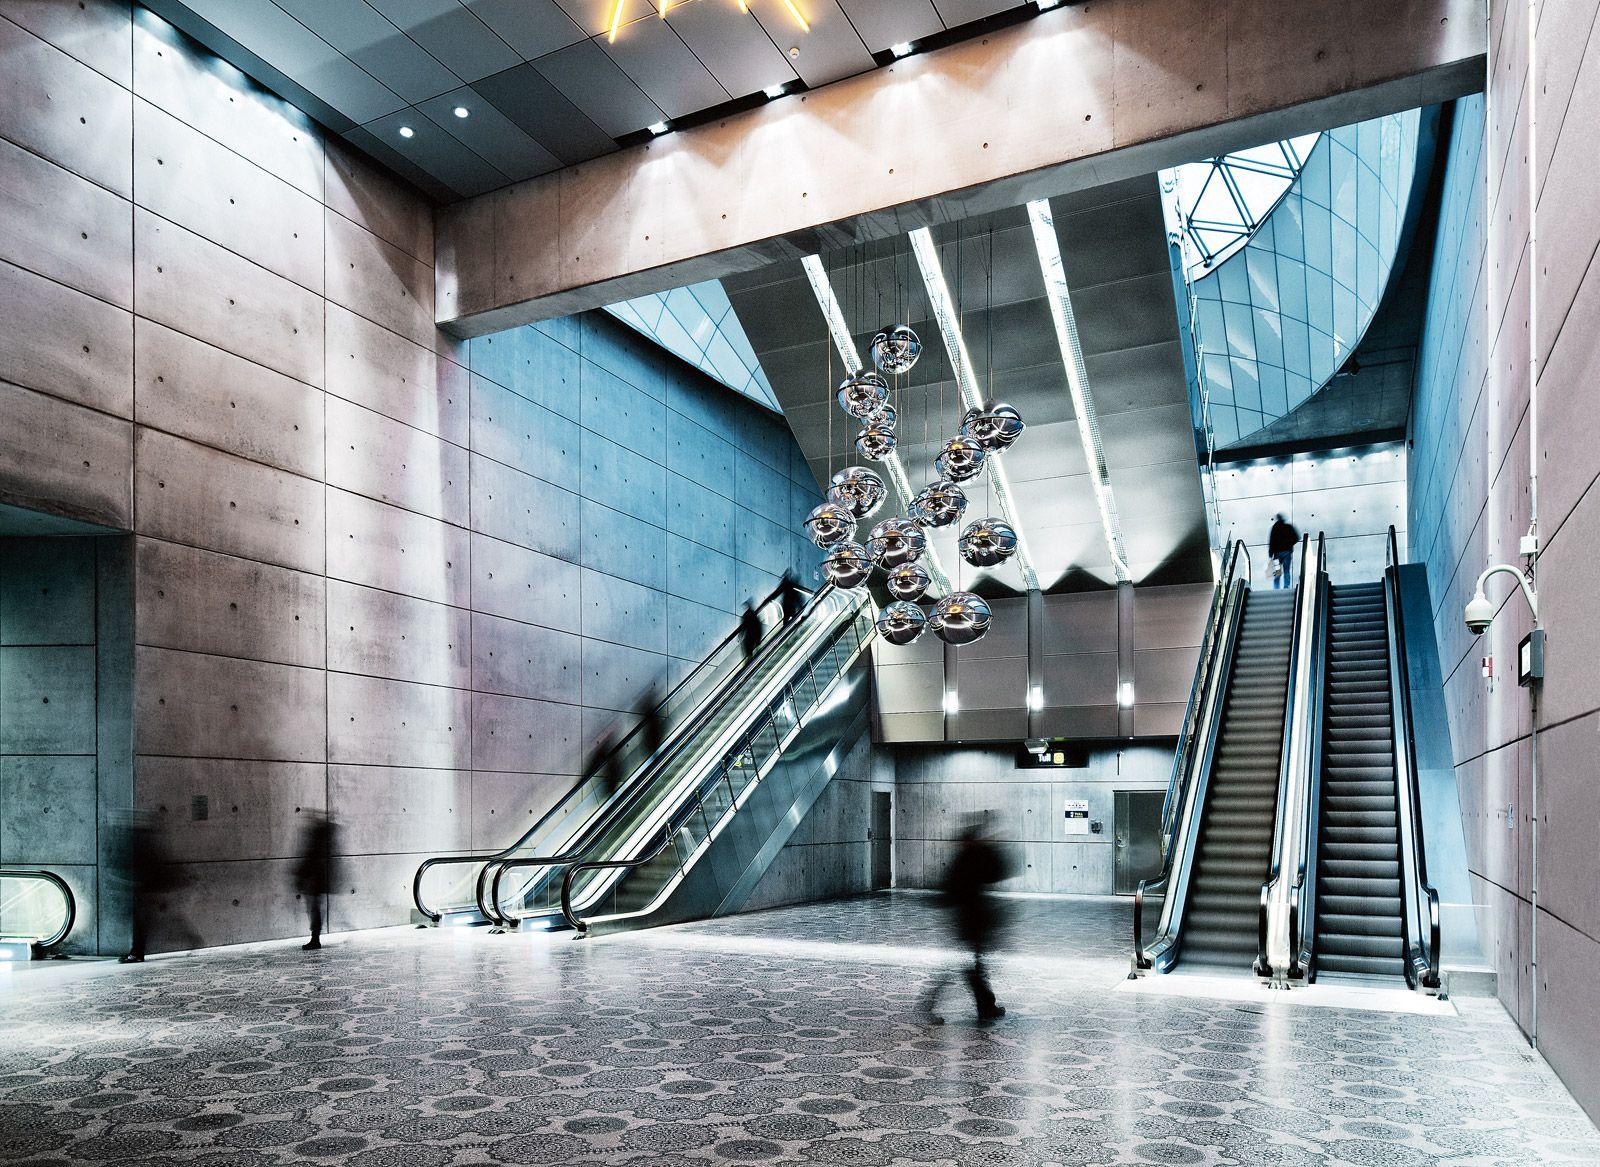 Студия фото плей станция метро